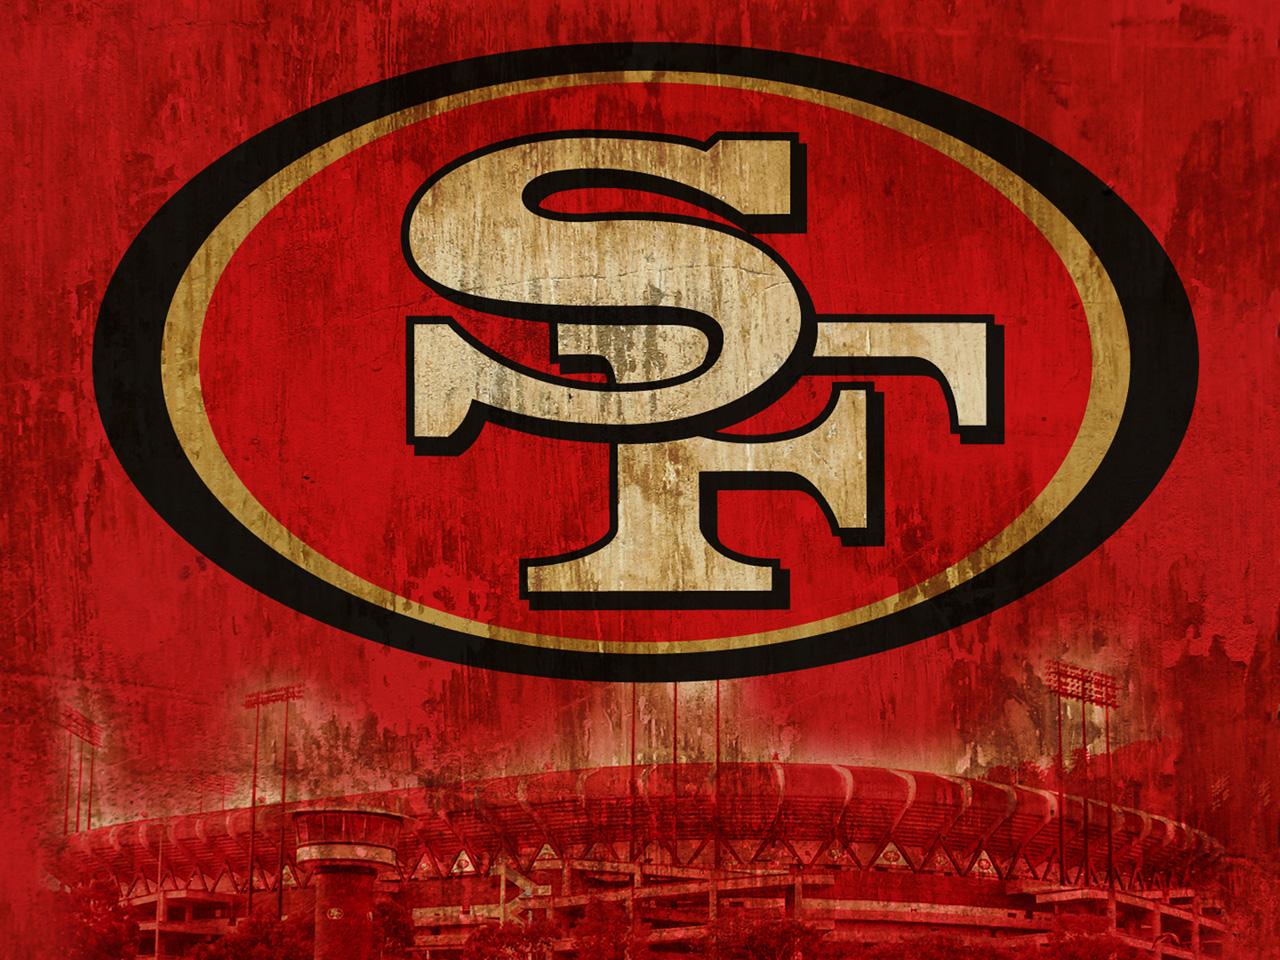 San Francisco 49ers wallpaper.jpg